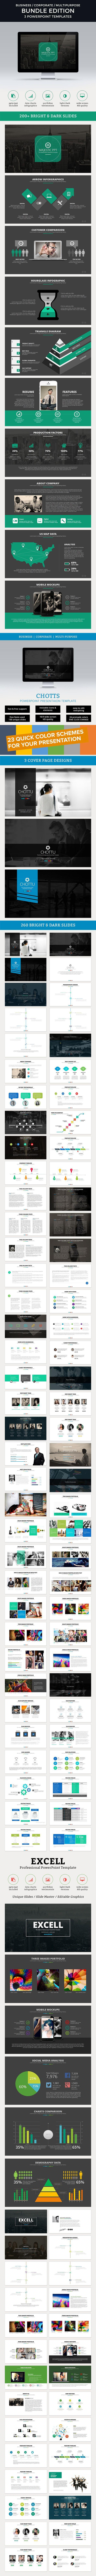 3-in-1 Bundle Edition - PowerPoint Templates #design #slides Download: http://graphicriver.net/item/3in1-bundle-edition/14350168?ref=ksioks